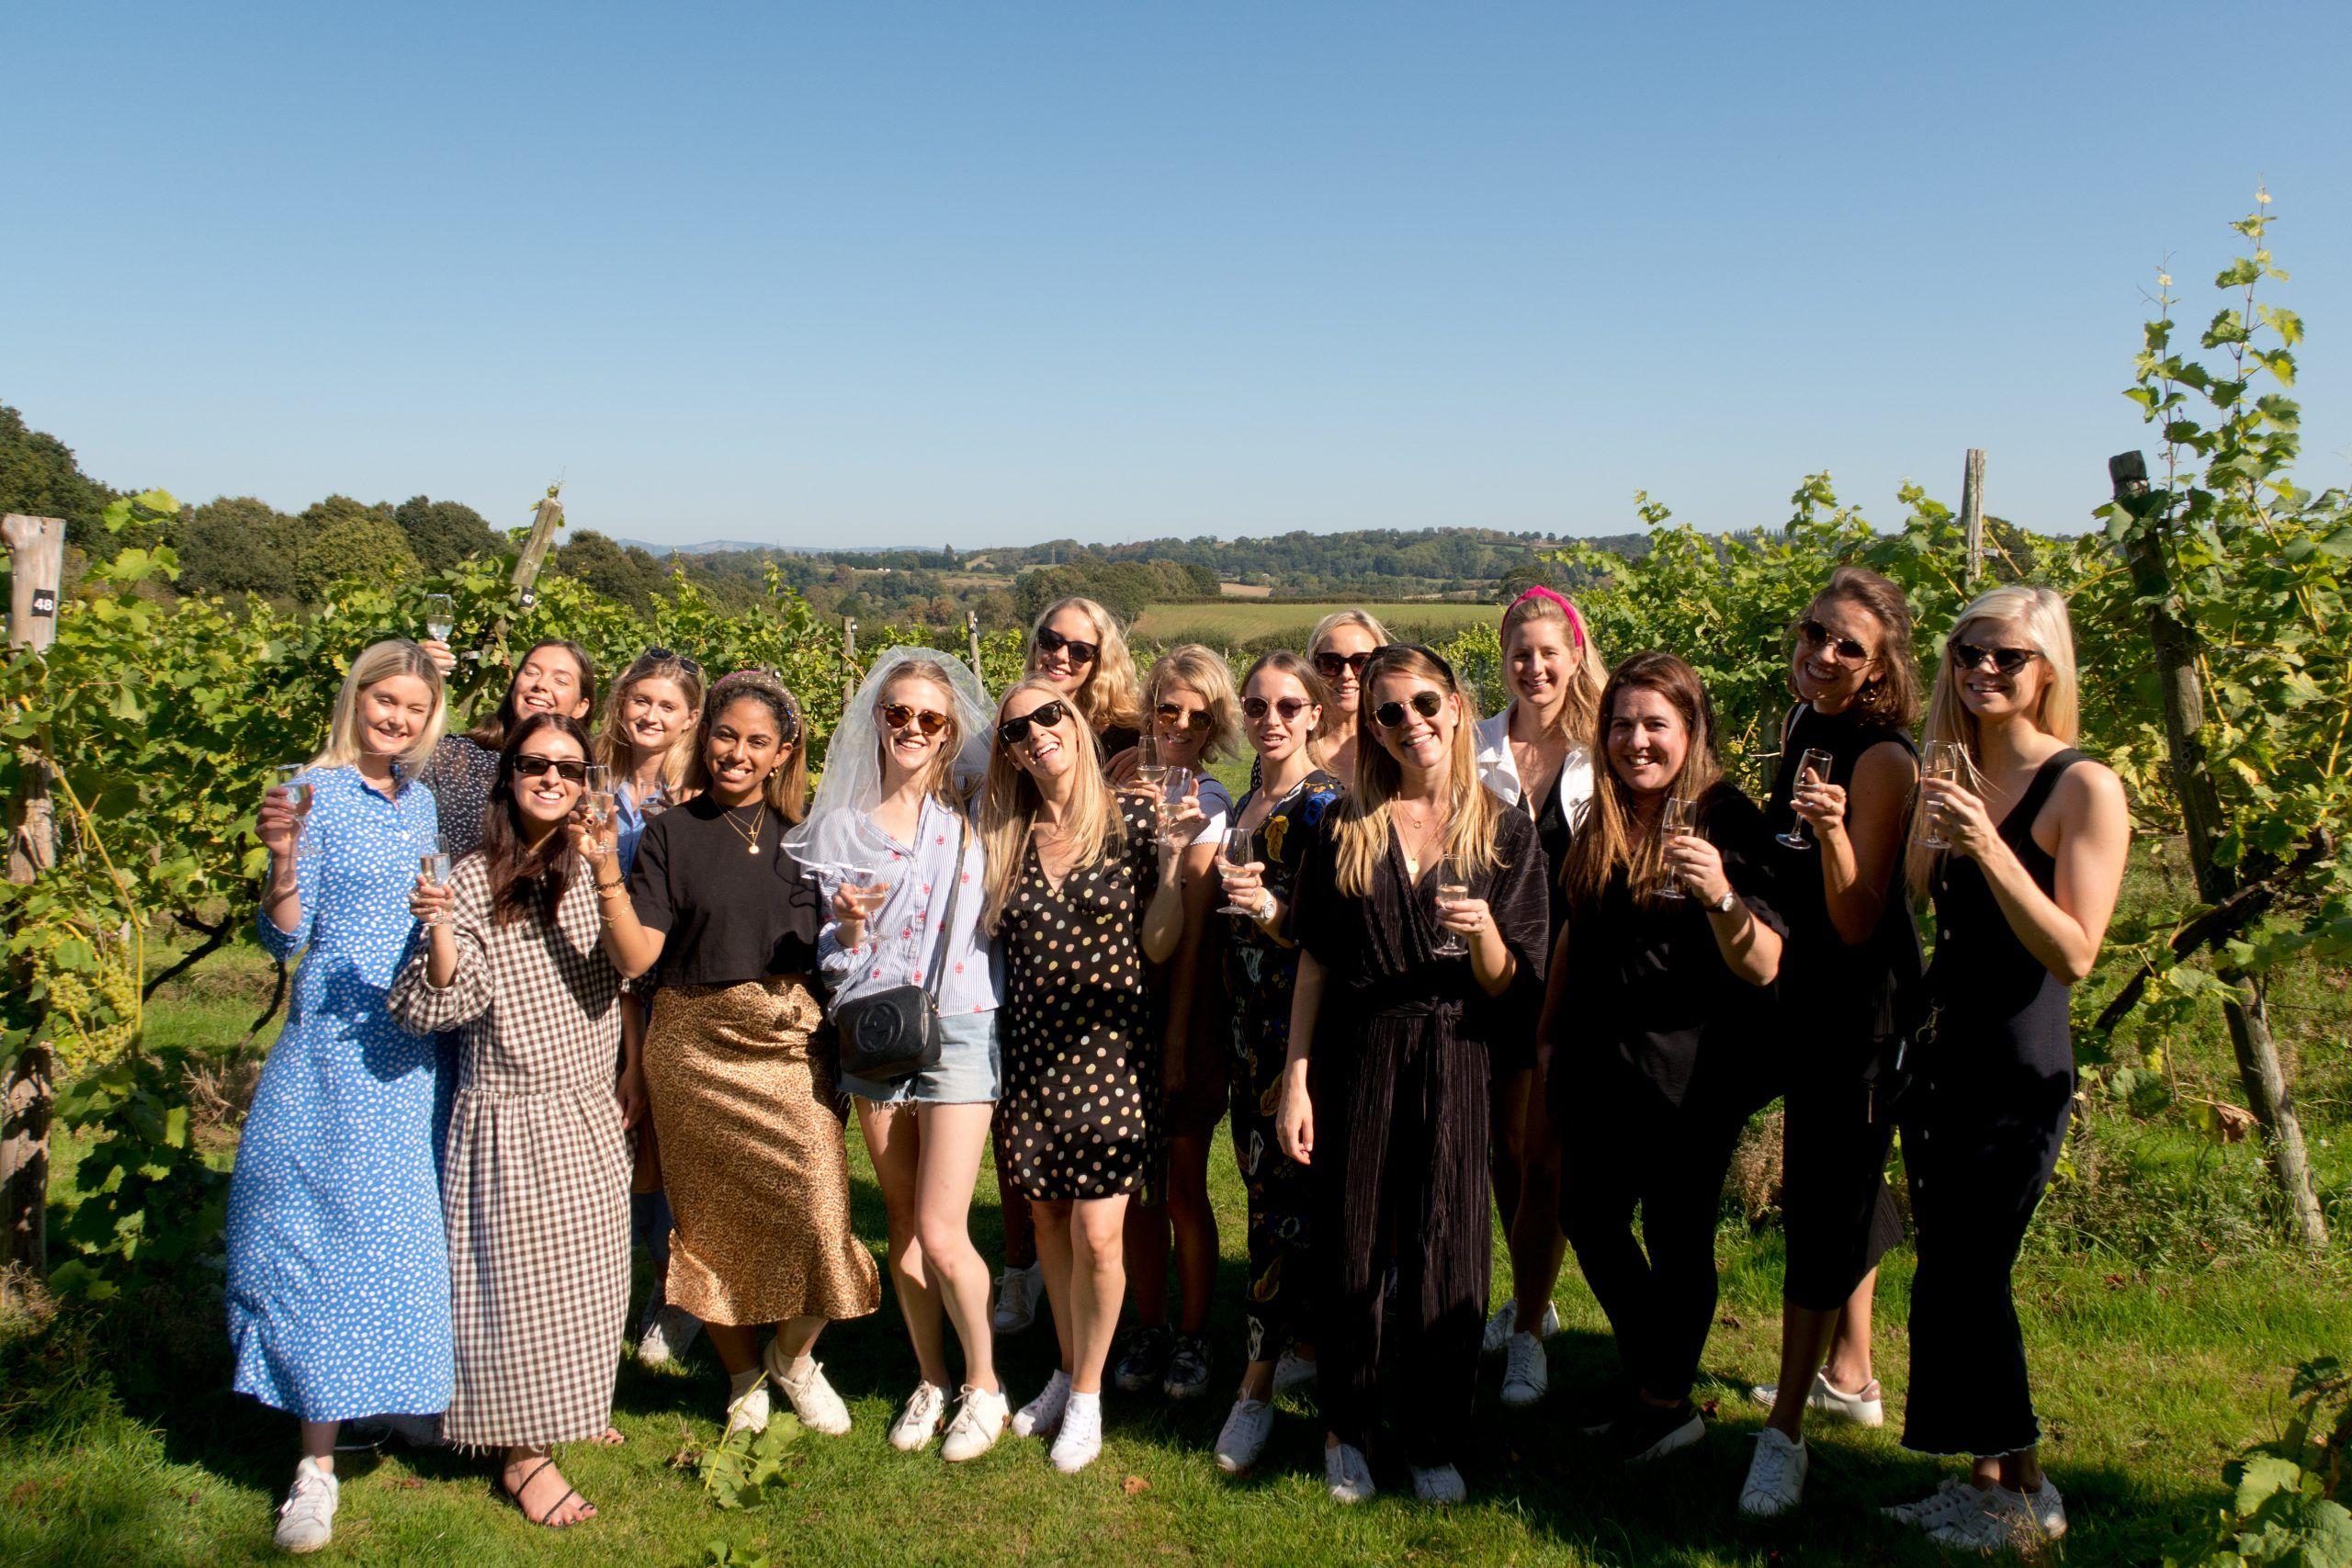 A vineyard tour in 2019